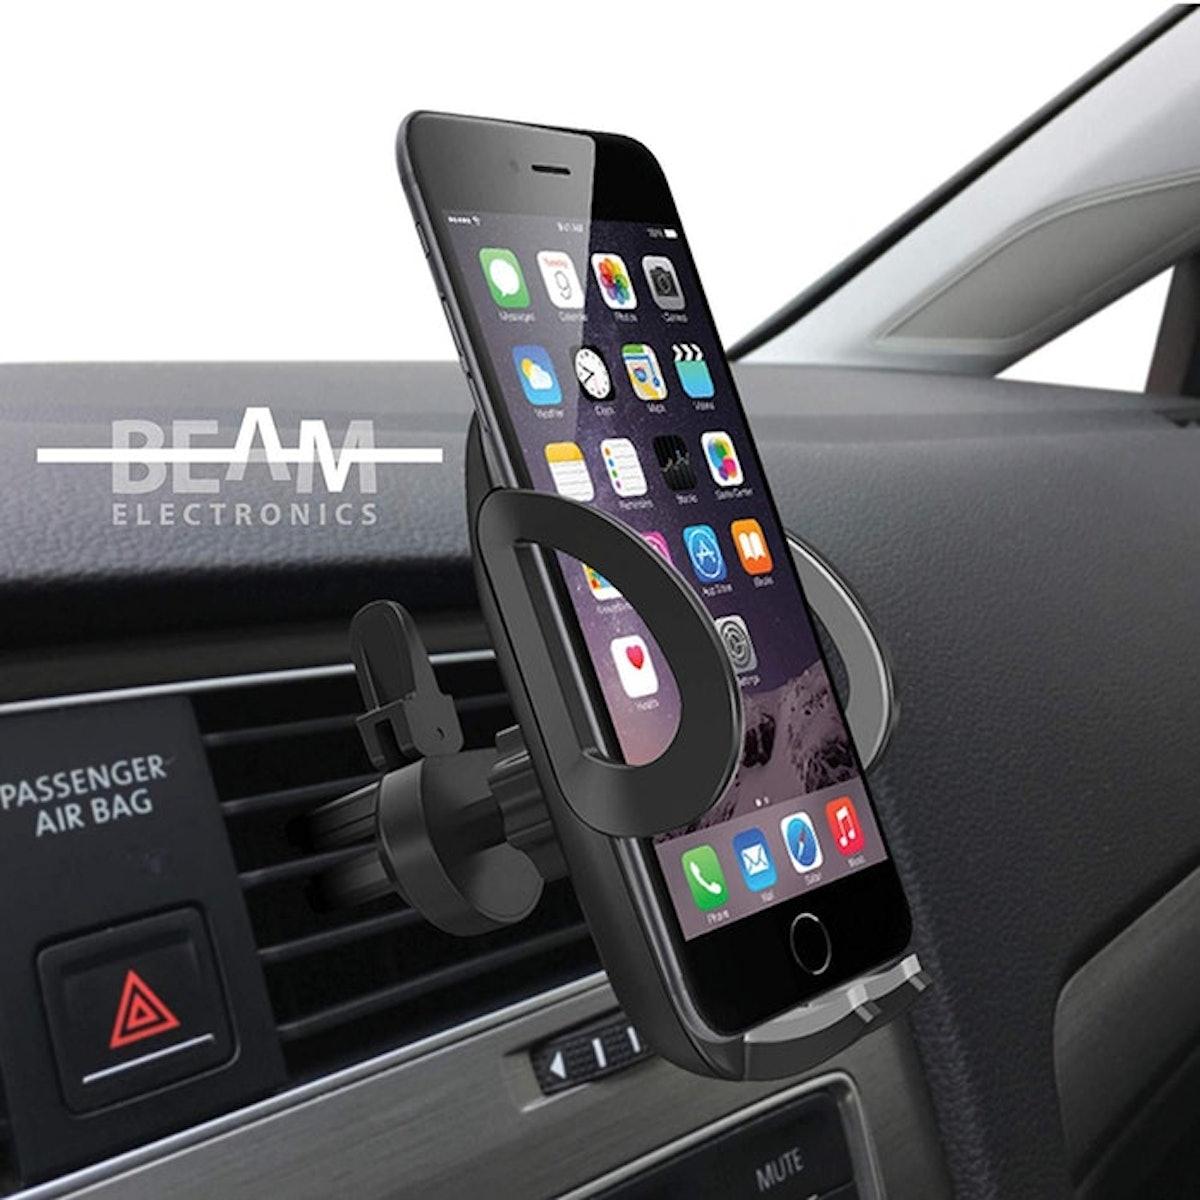 Beam Electronics Car Smartphone Mount